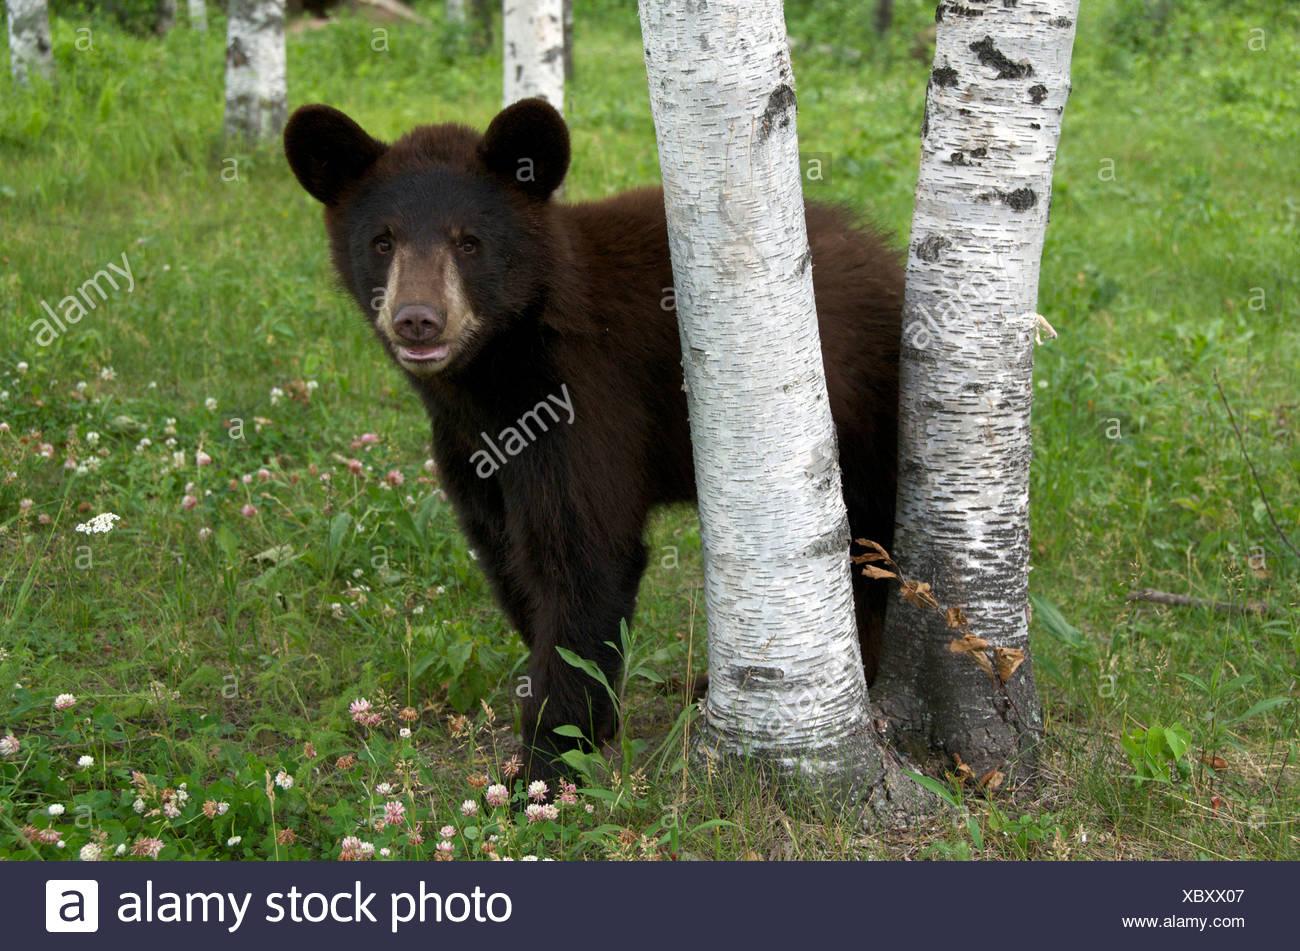 A wild male Black Bear (Ursus americanus) standing next to aspen trees in Sleeping Giant Provincial Park, Ontario, Canada Stock Photo